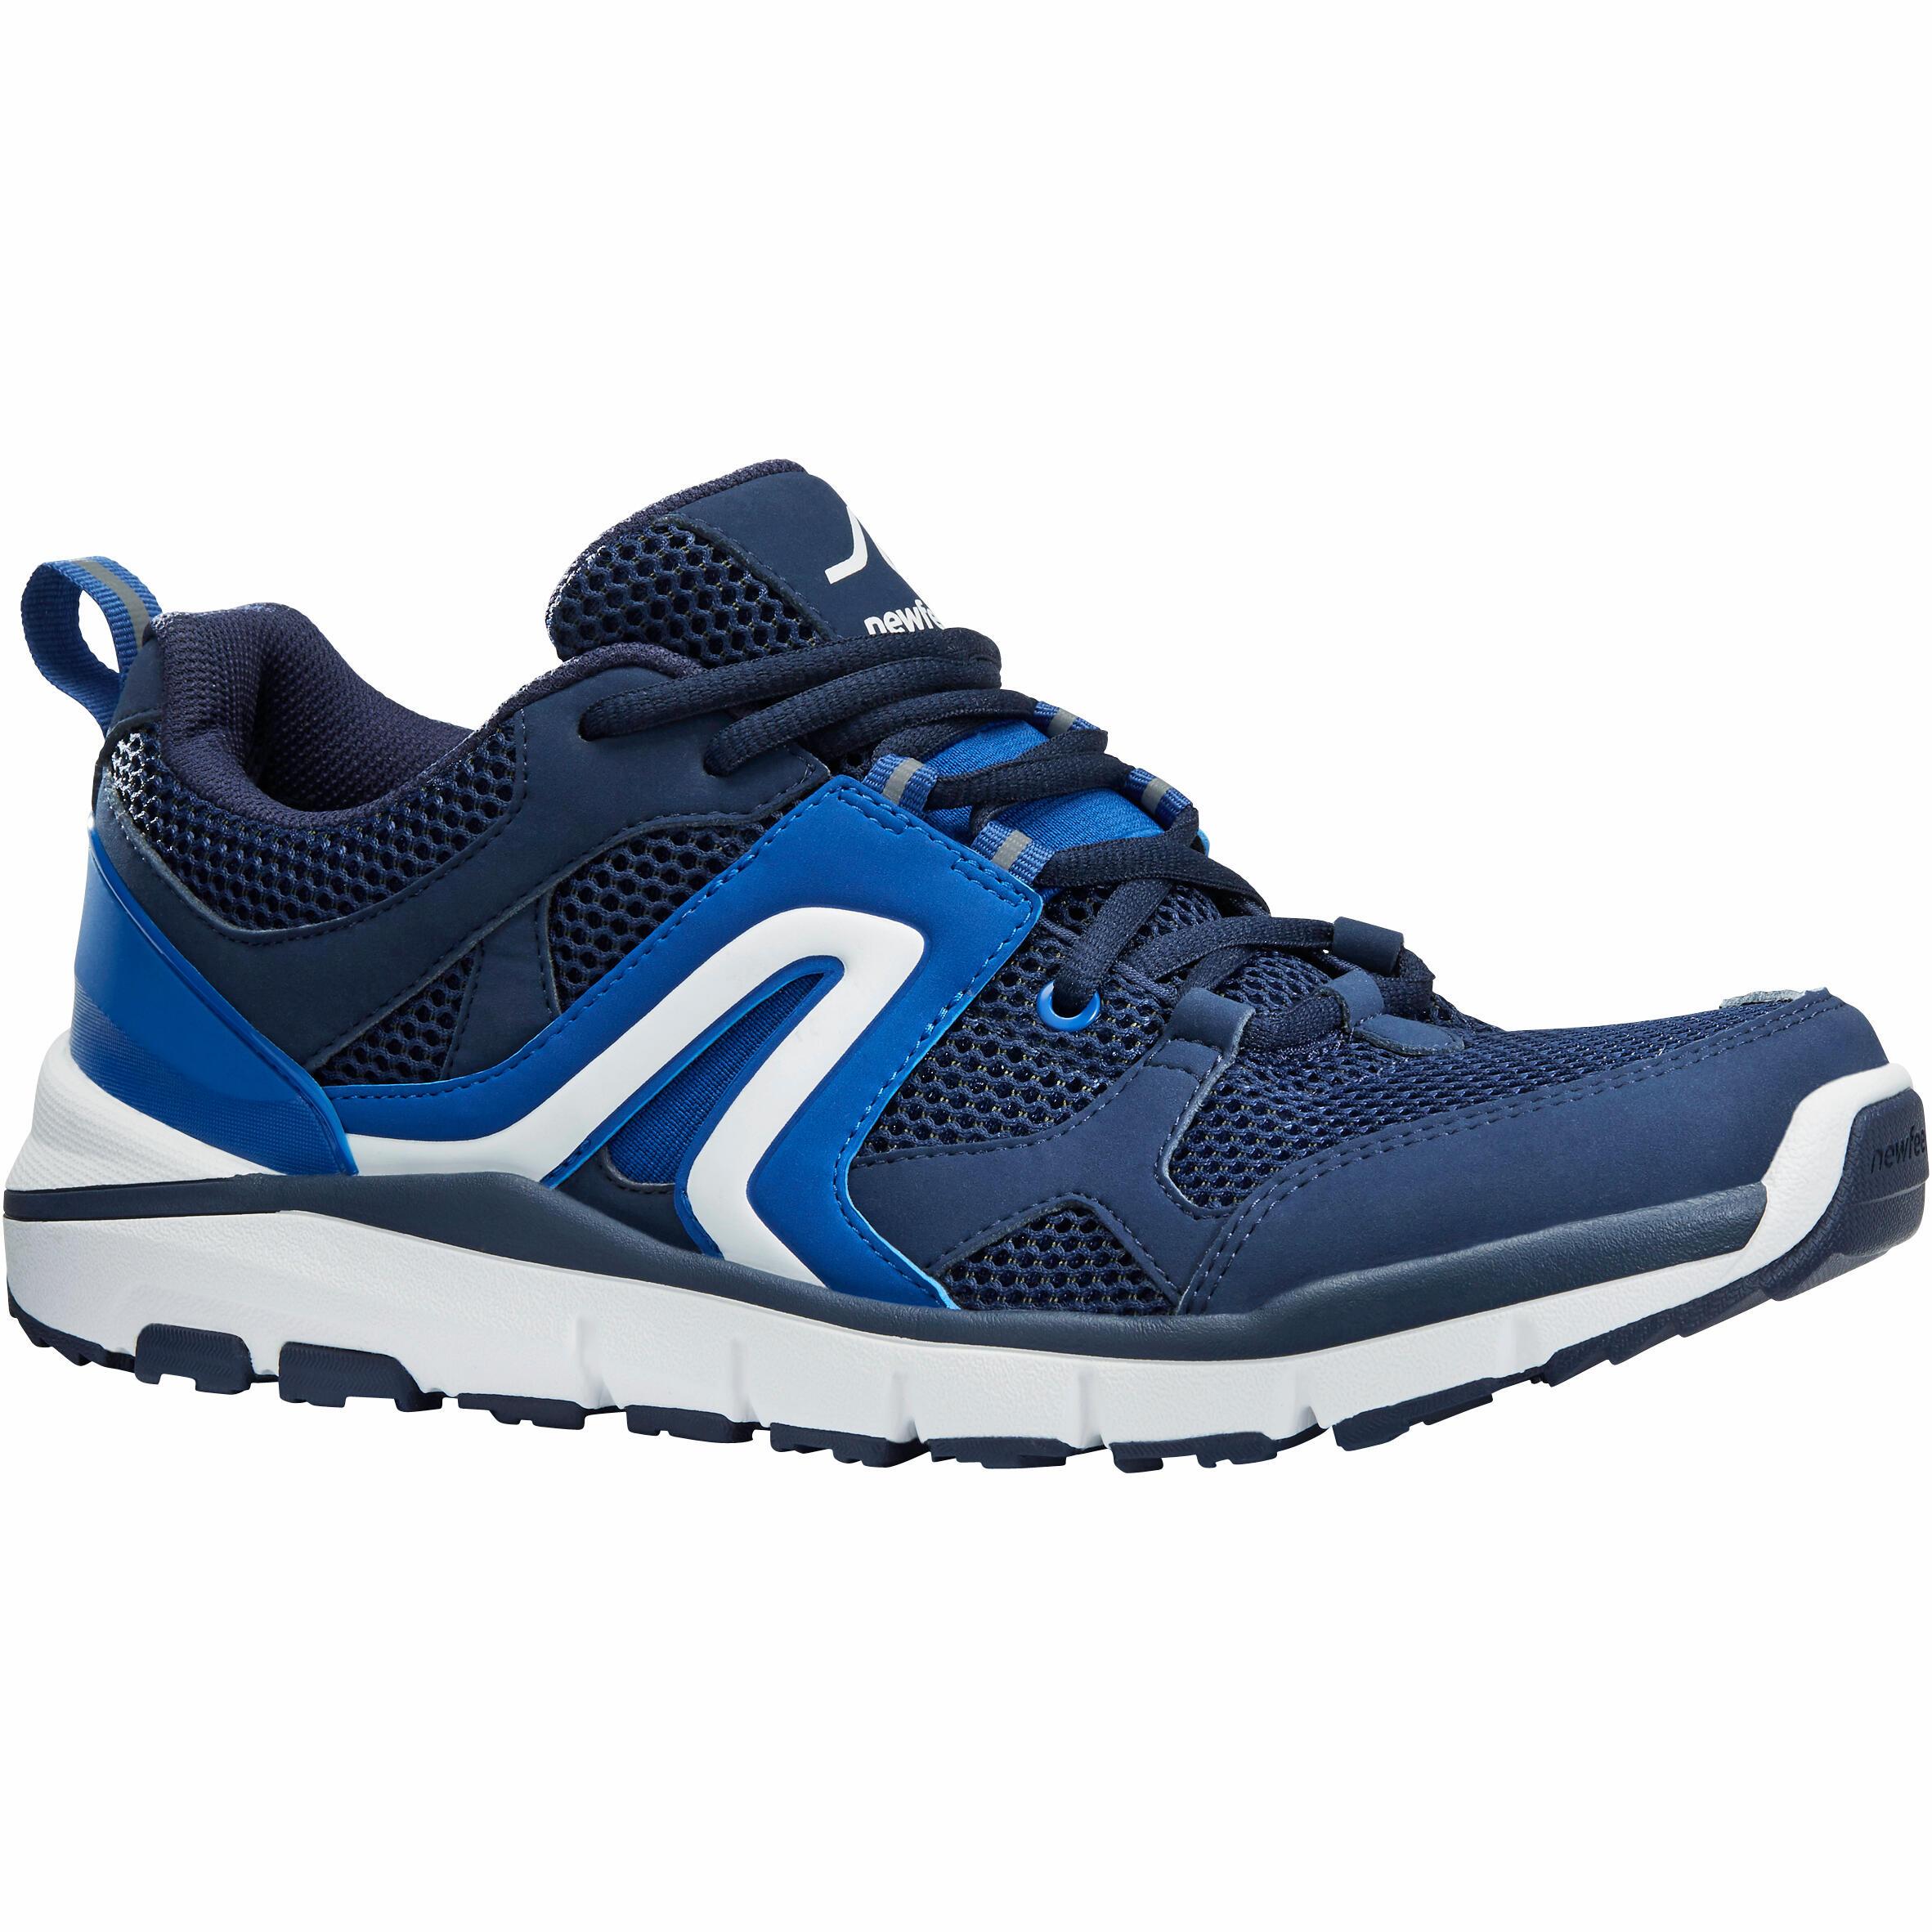 Chaussures marche sportive homme hw 500 mesh marine newfeel